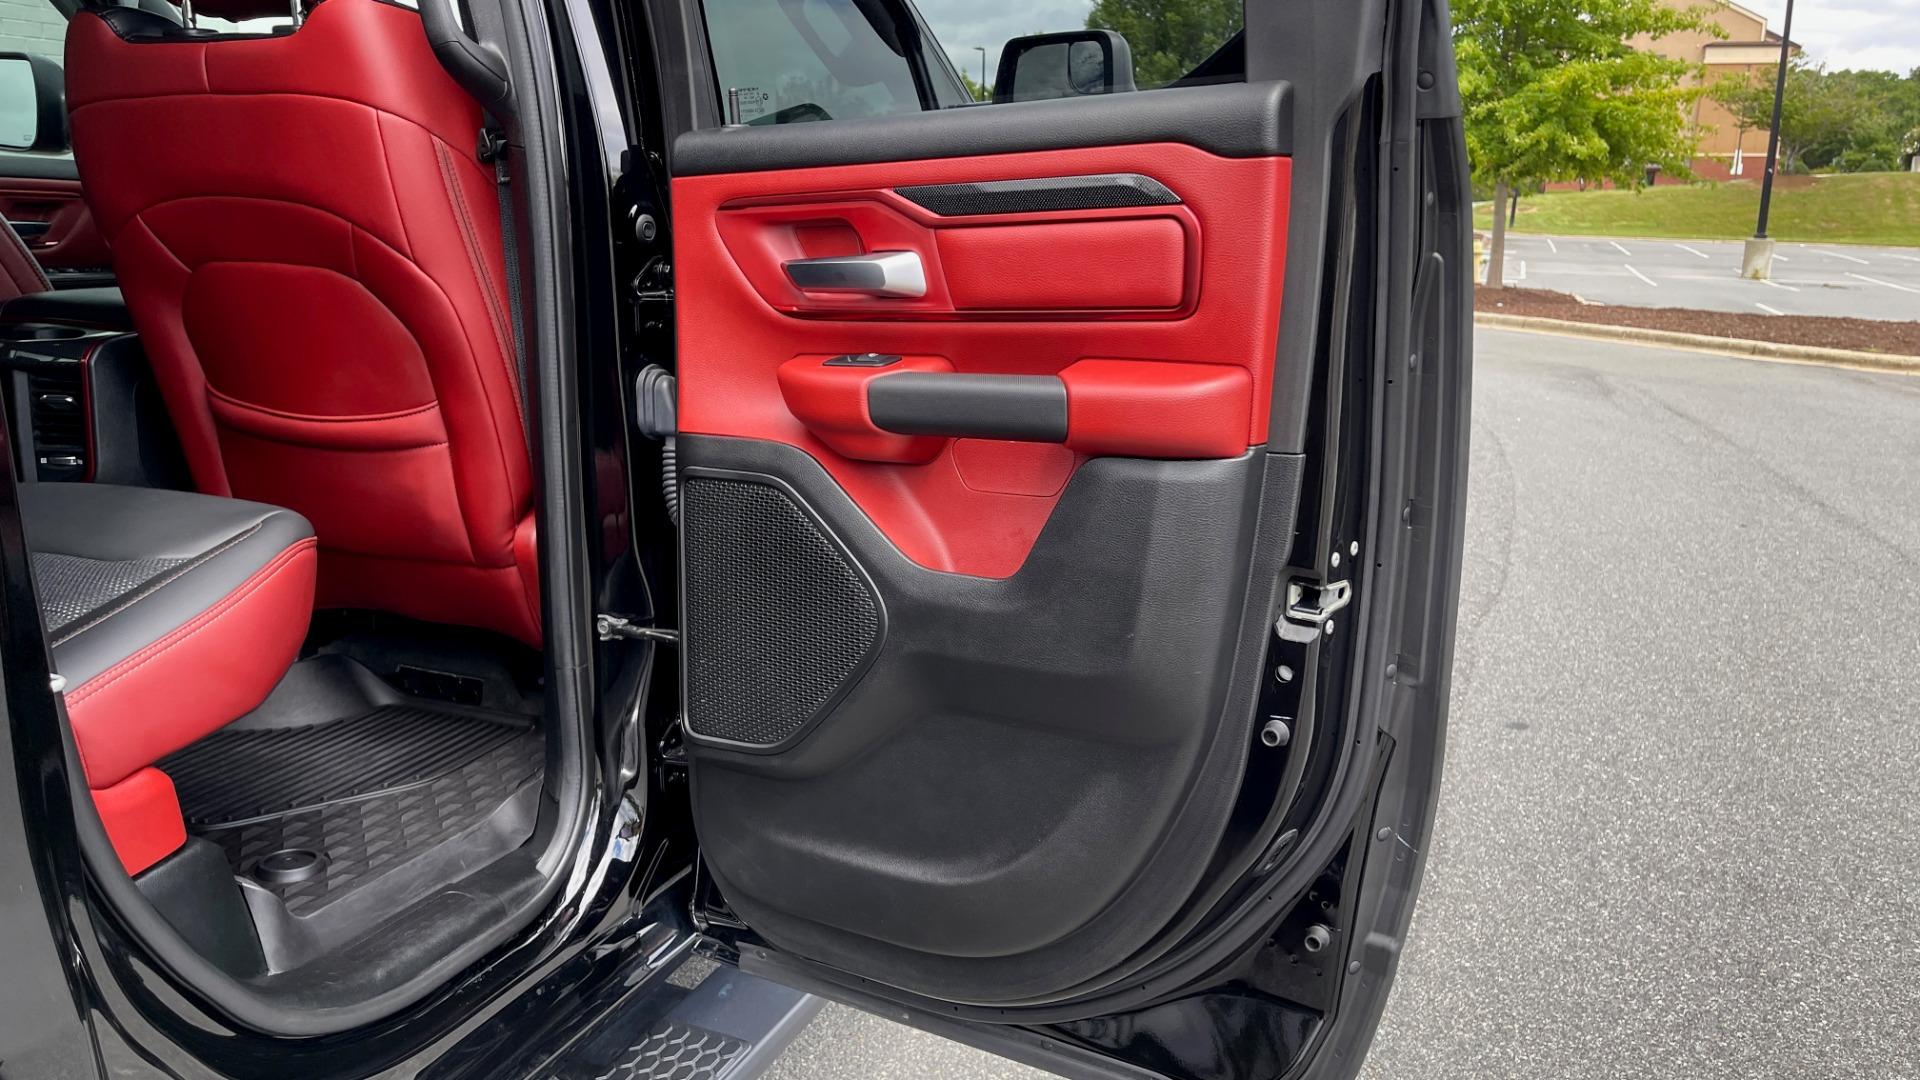 Used 2019 Ram 1500 REBEL QUADCAB 4X4 / 5.7L HEMI / 8-SPD AUTO / REMOTE START / PARK ASSIST for sale $44,495 at Formula Imports in Charlotte NC 28227 58